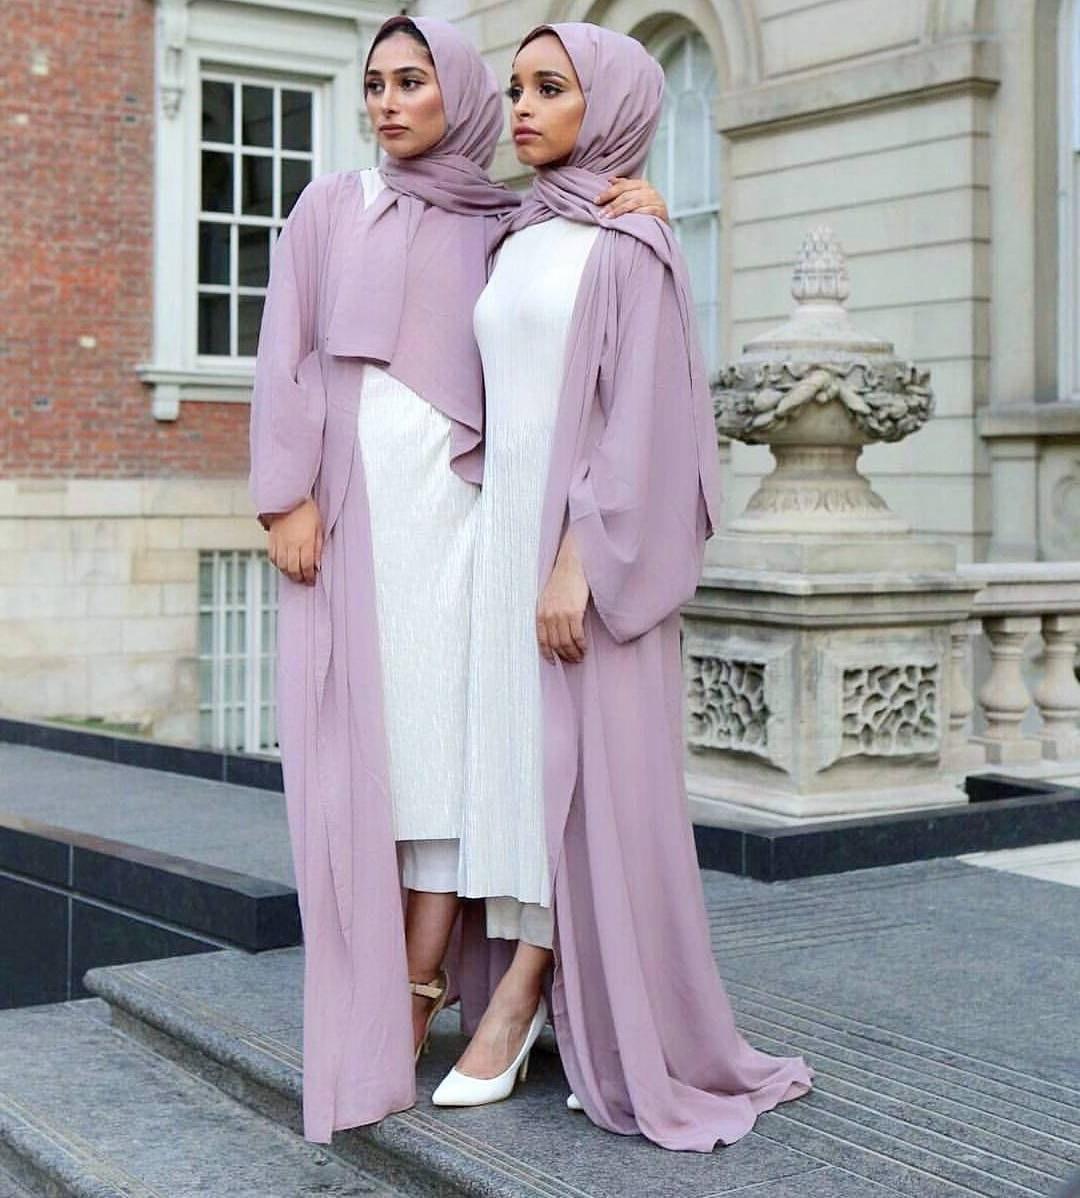 Ide Model Baju Lebaran Sekeluarga 2018 D0dg 50 Model Baju Lebaran Terbaru 2018 Modern & Elegan